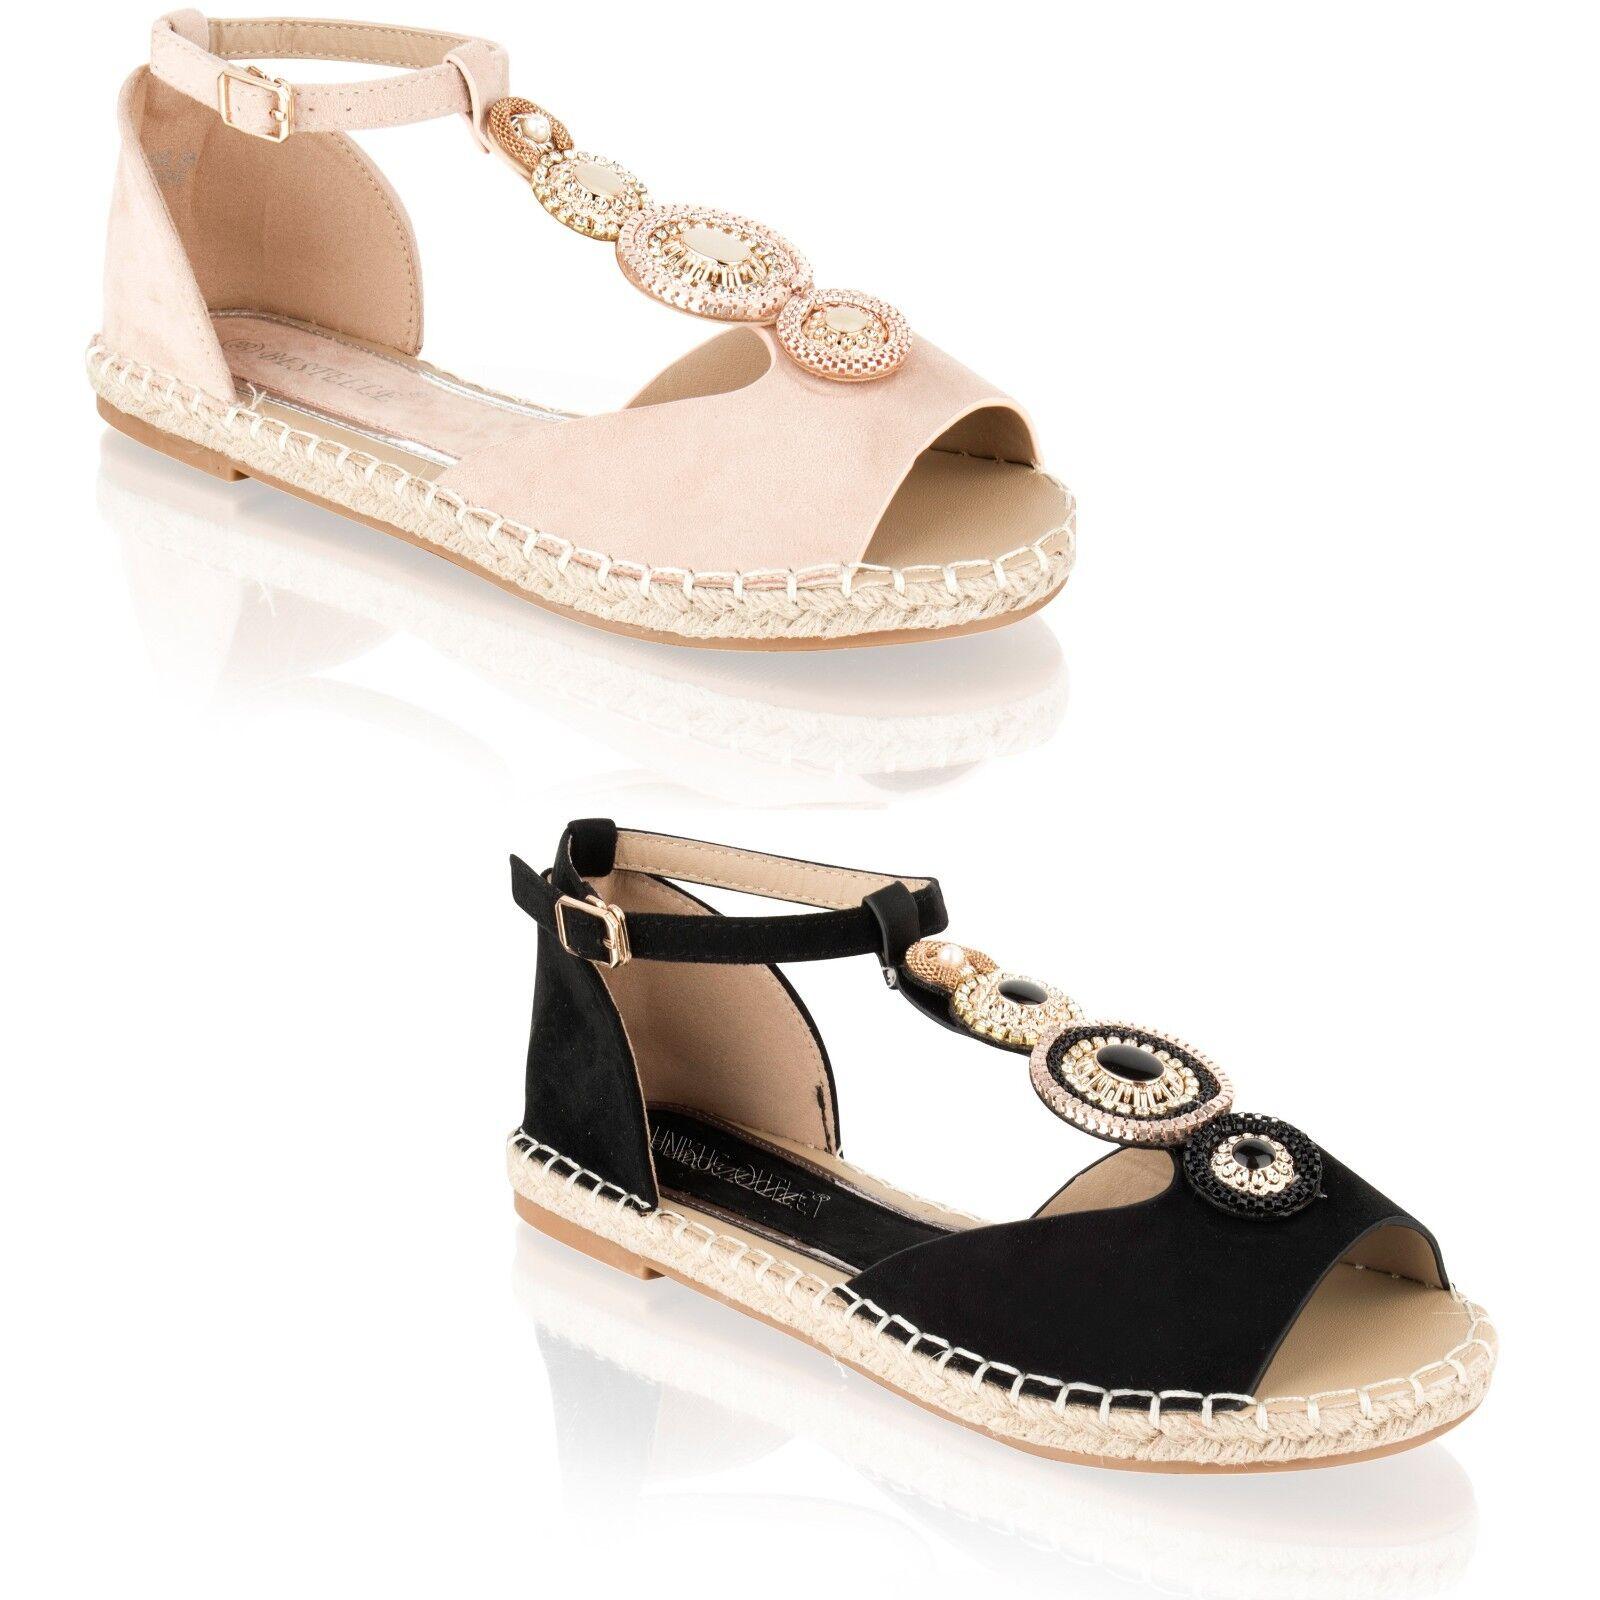 Womens Summer Ladies Flat Espadrille Diamante Summer Womens Sandals Ankle Strap Peep Toe Shoes c74563